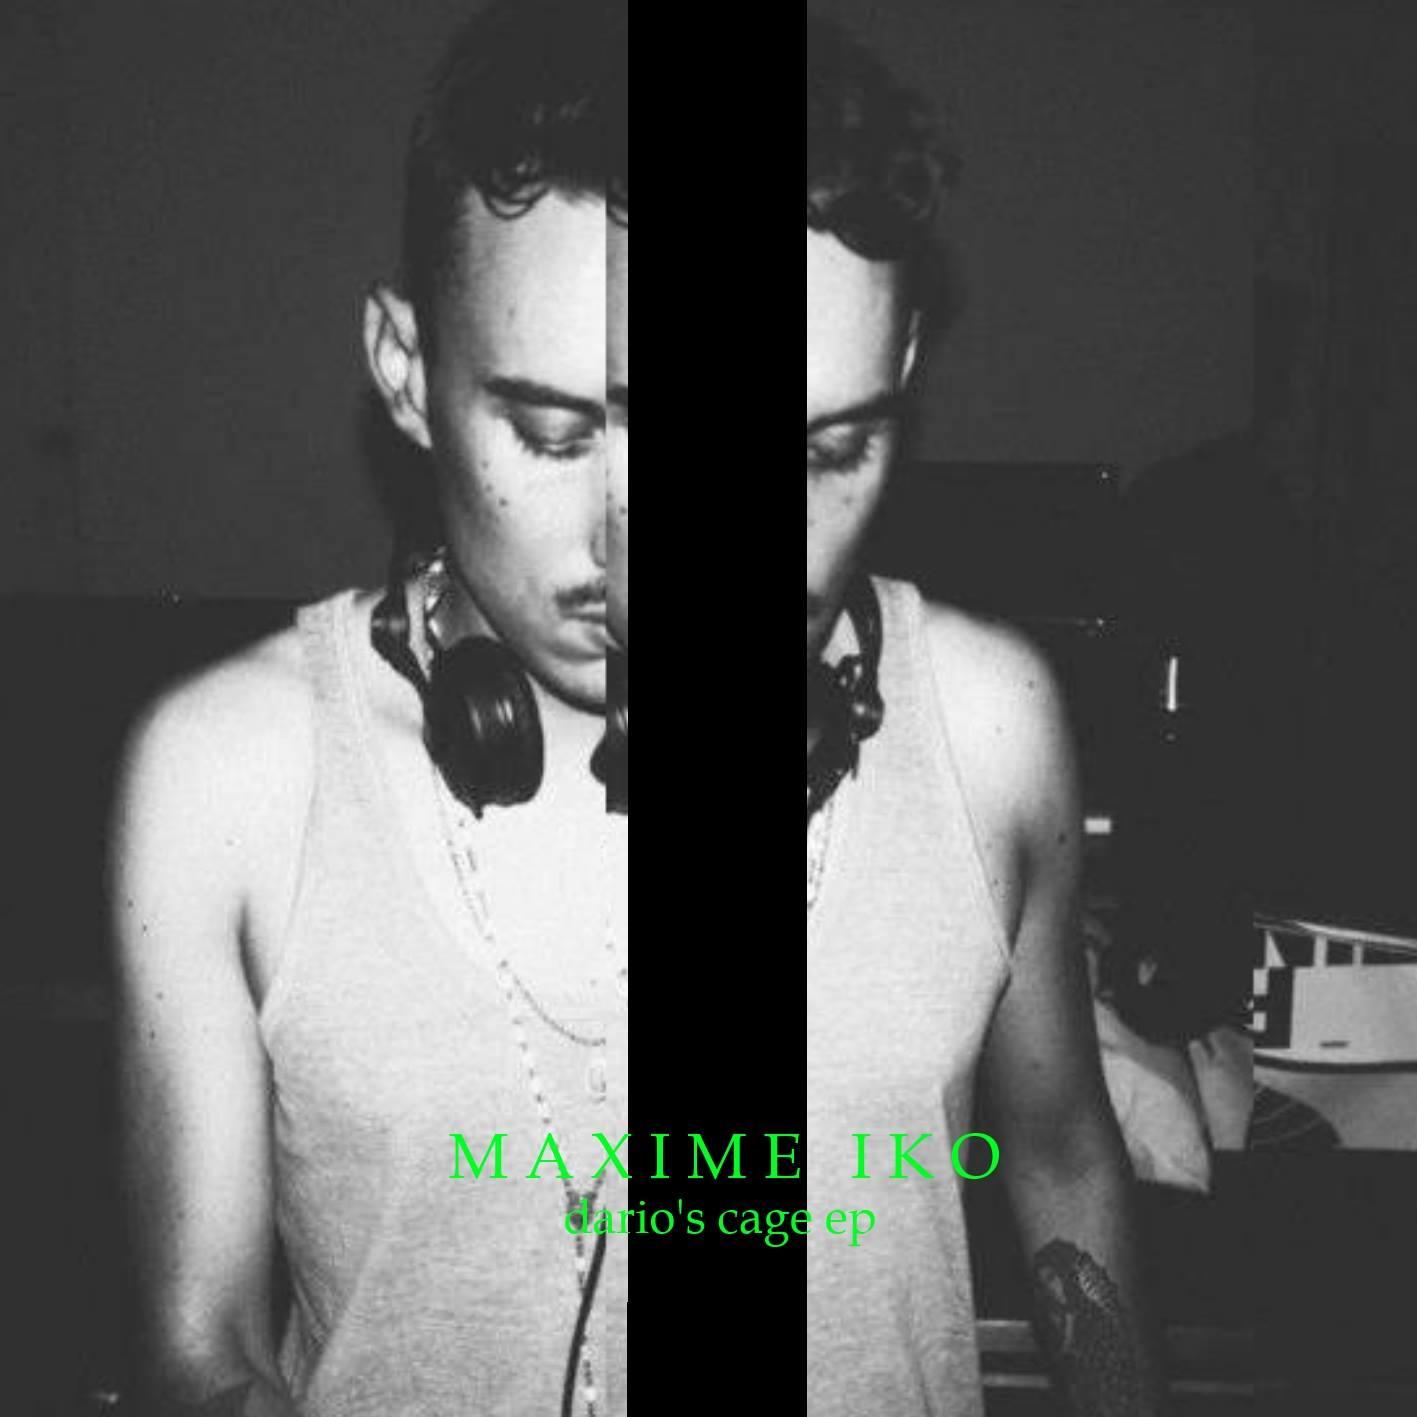 Maxime Iko – Dario's Cage EP (Loveyeah)